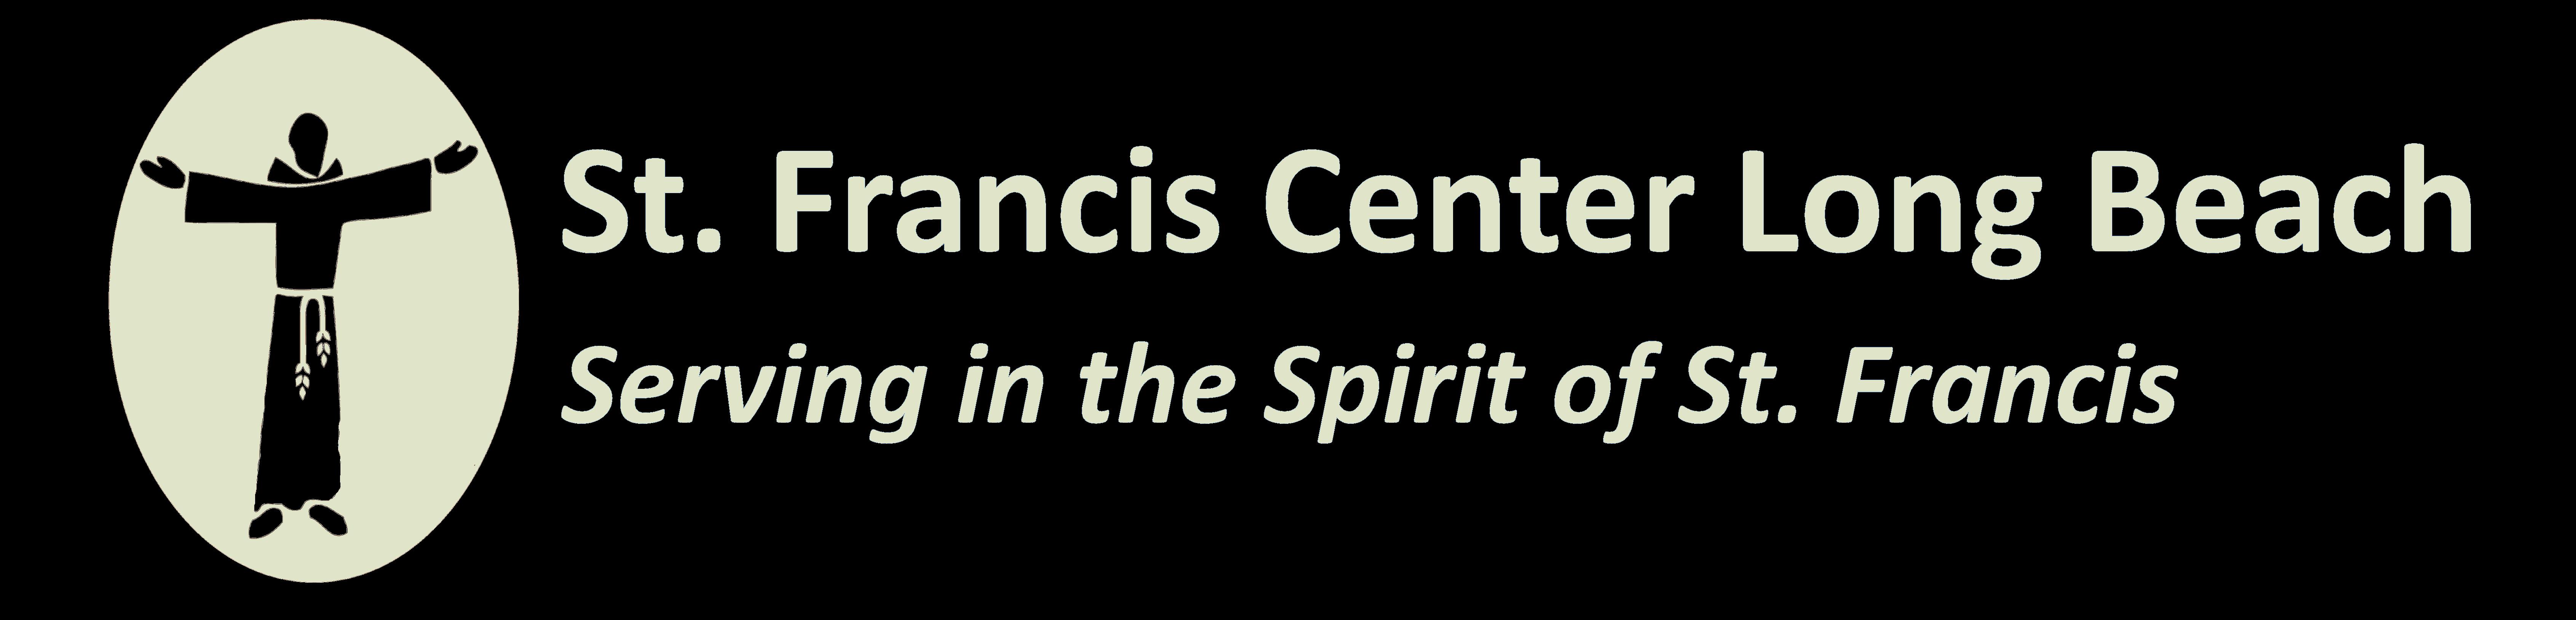 St Francis Center Long Beach